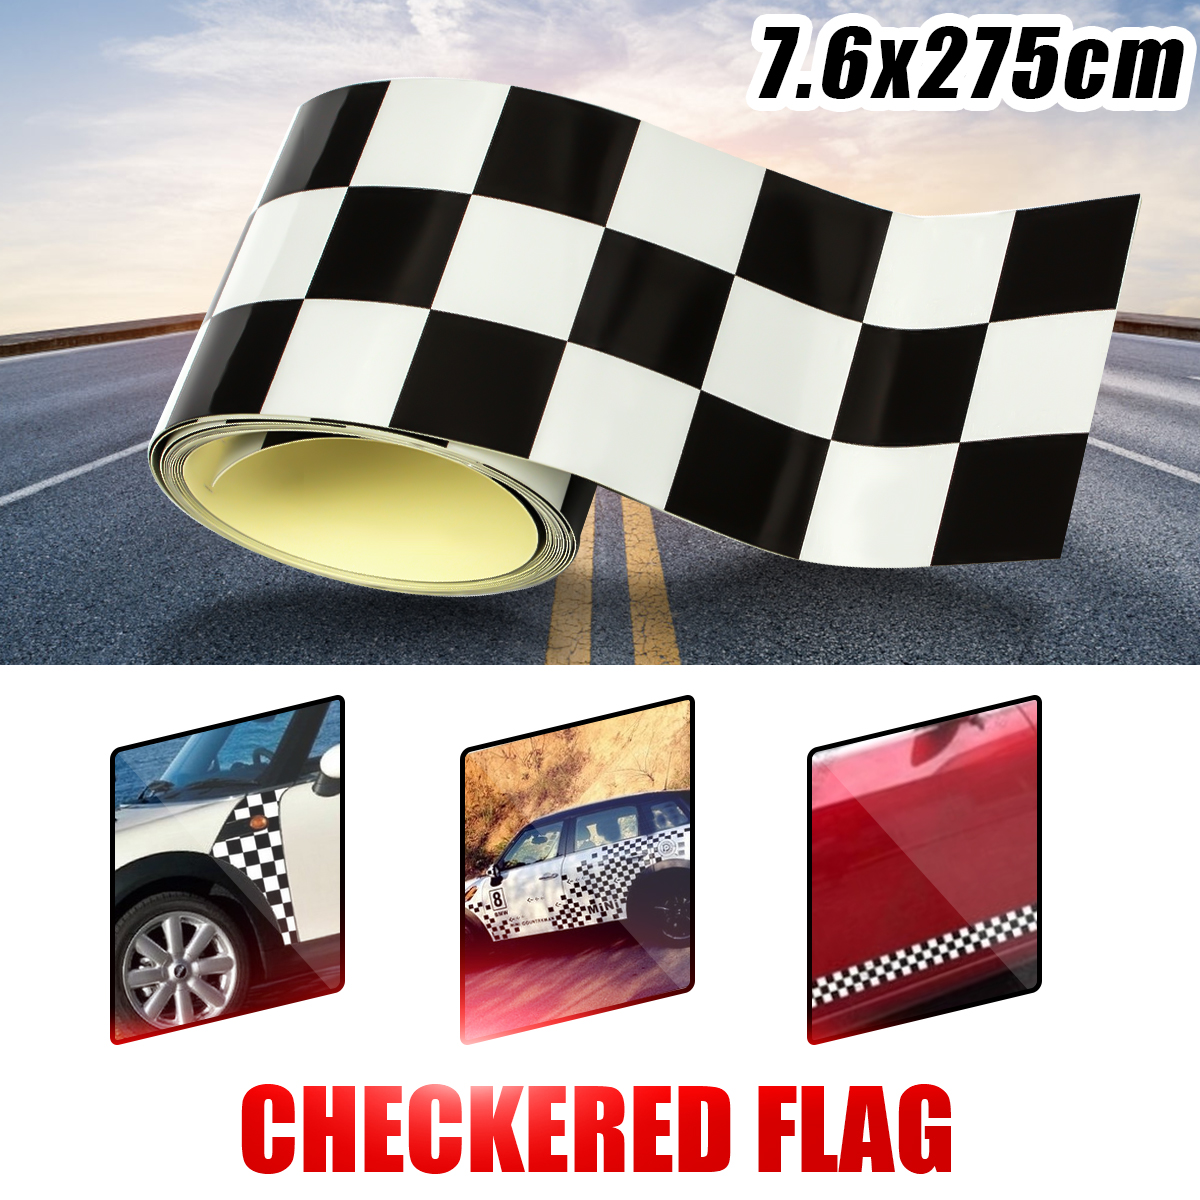 3 Inch Black/White Vinyl Checkered Flag Decal Tape Car Bike Motorcycle Tank Sticker